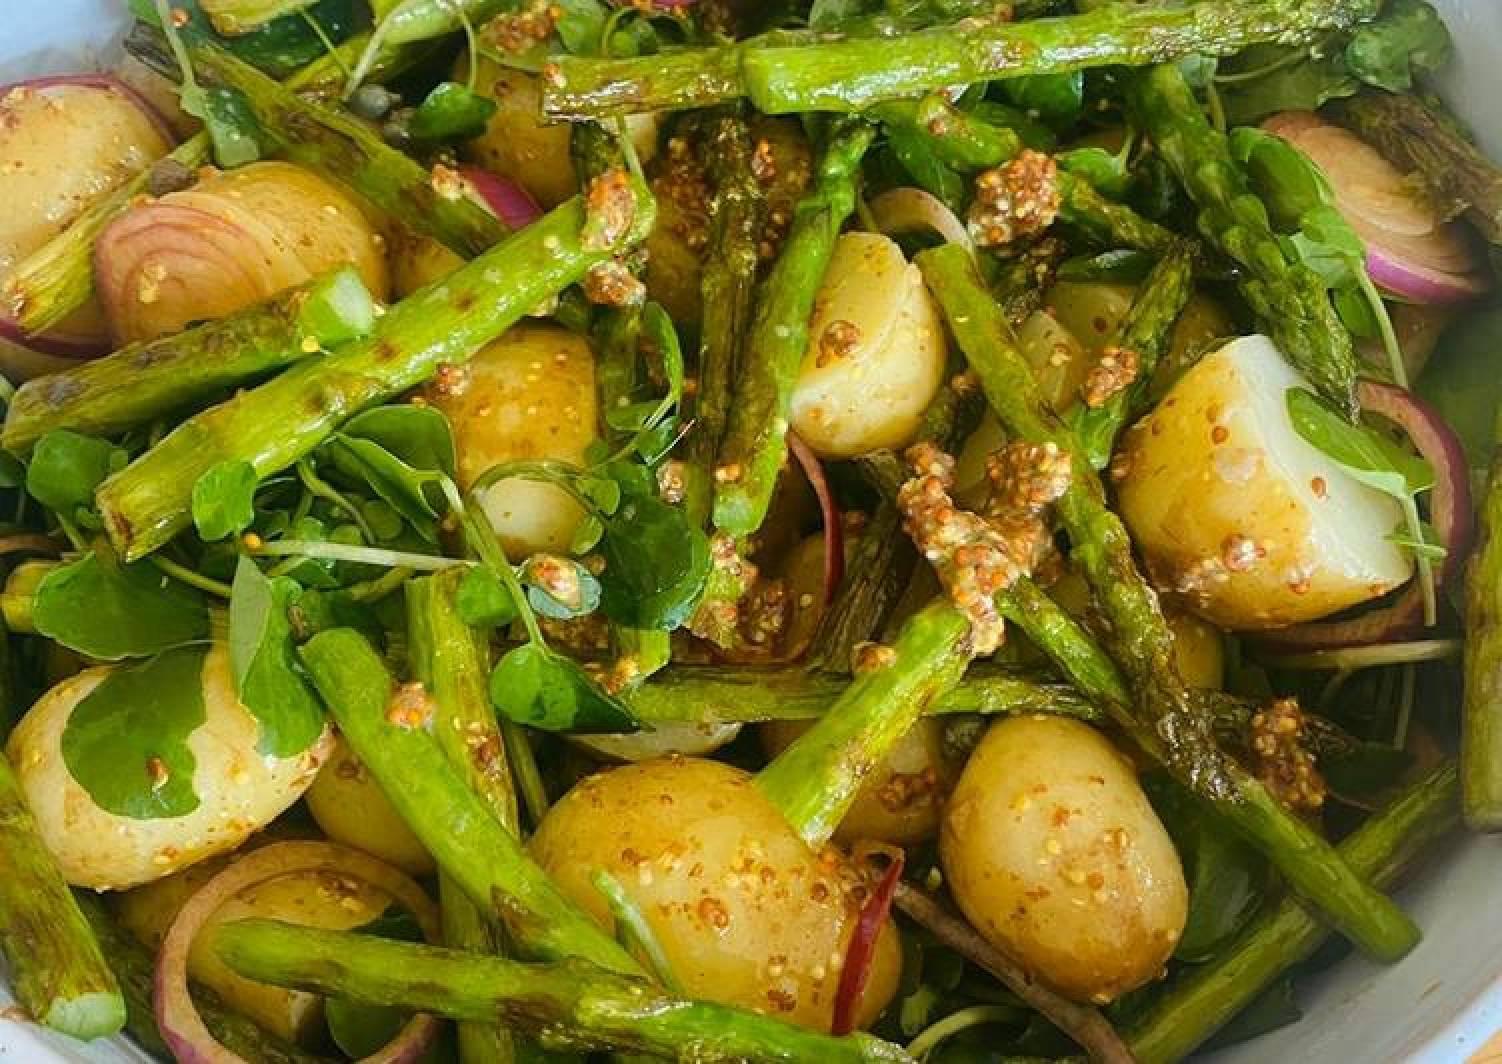 Potato salad with asparagus